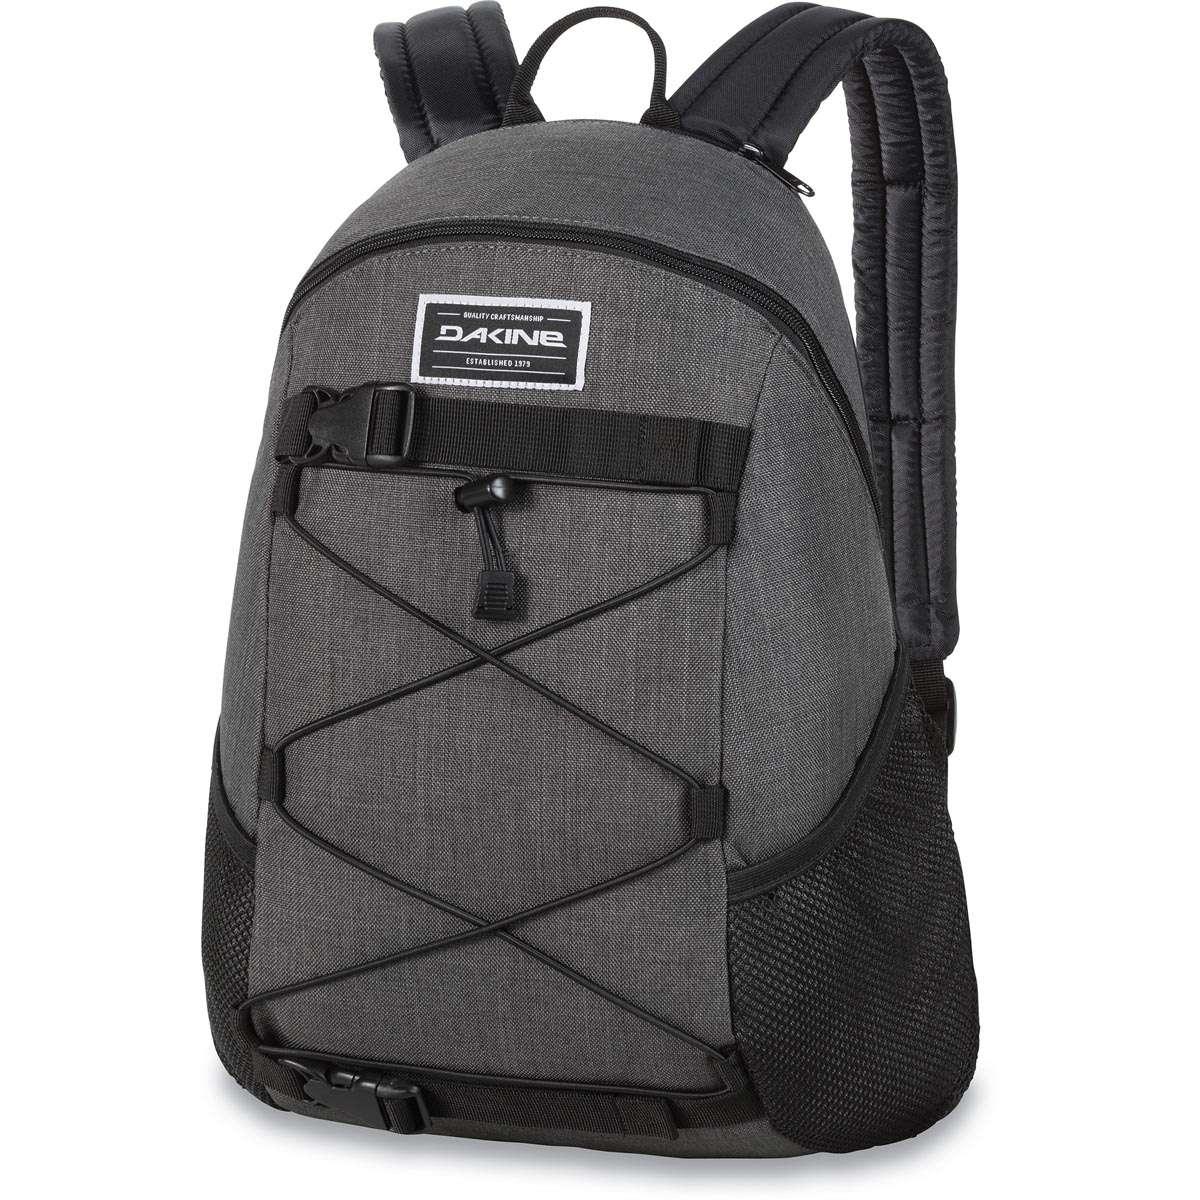 1105d3411a5a2 Dakine Wonder 15L Backpack Carbon